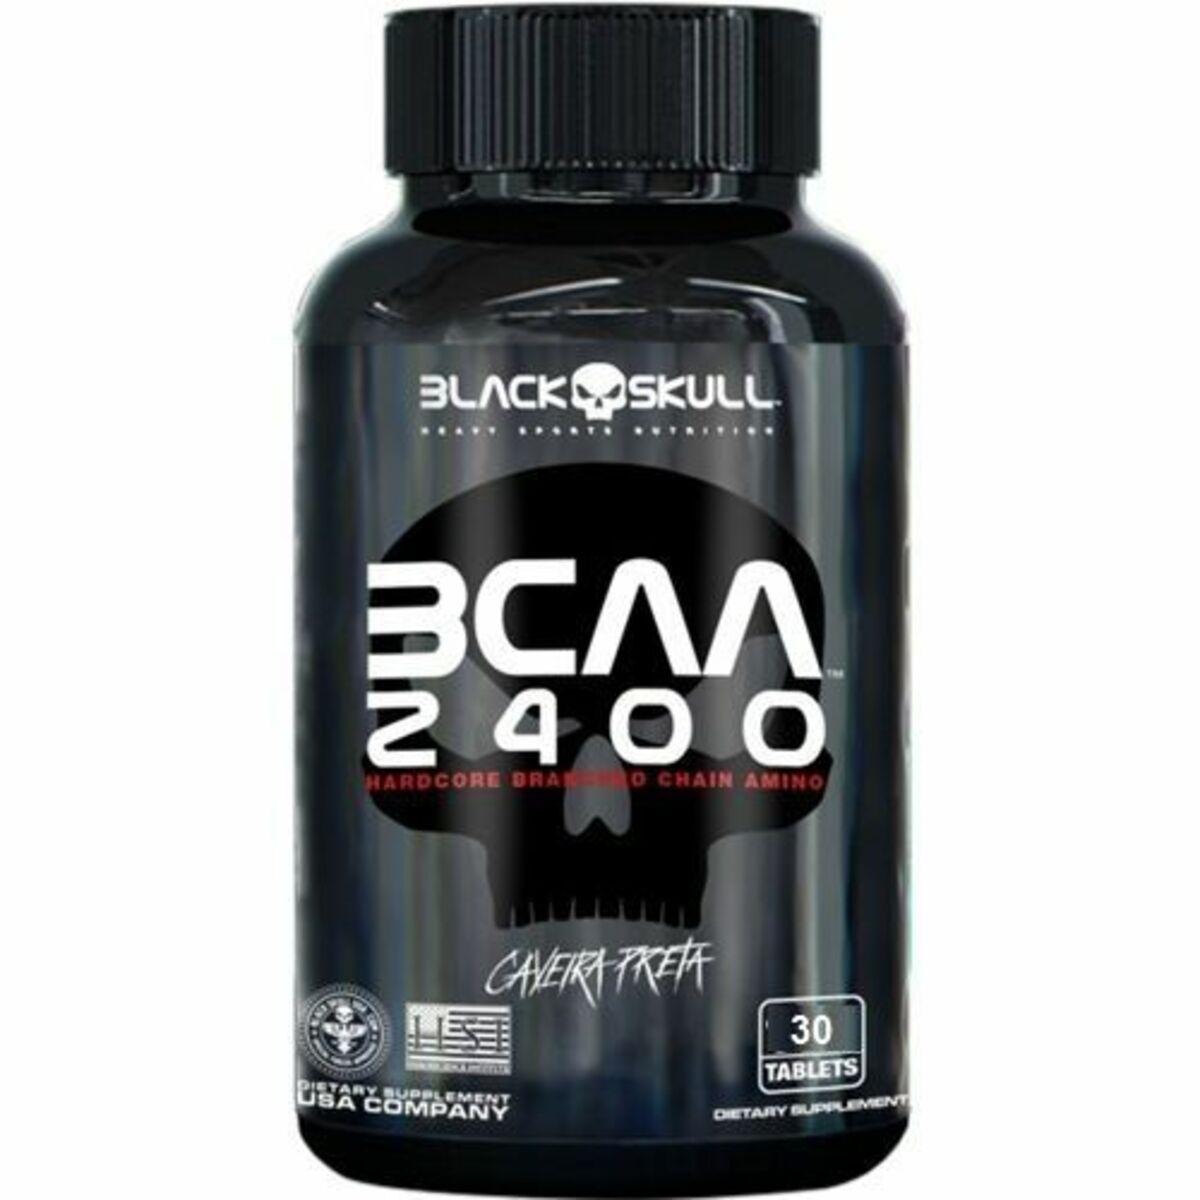 Bcaa 2400 30 Tabletes - Black Skull - Caveira Preta